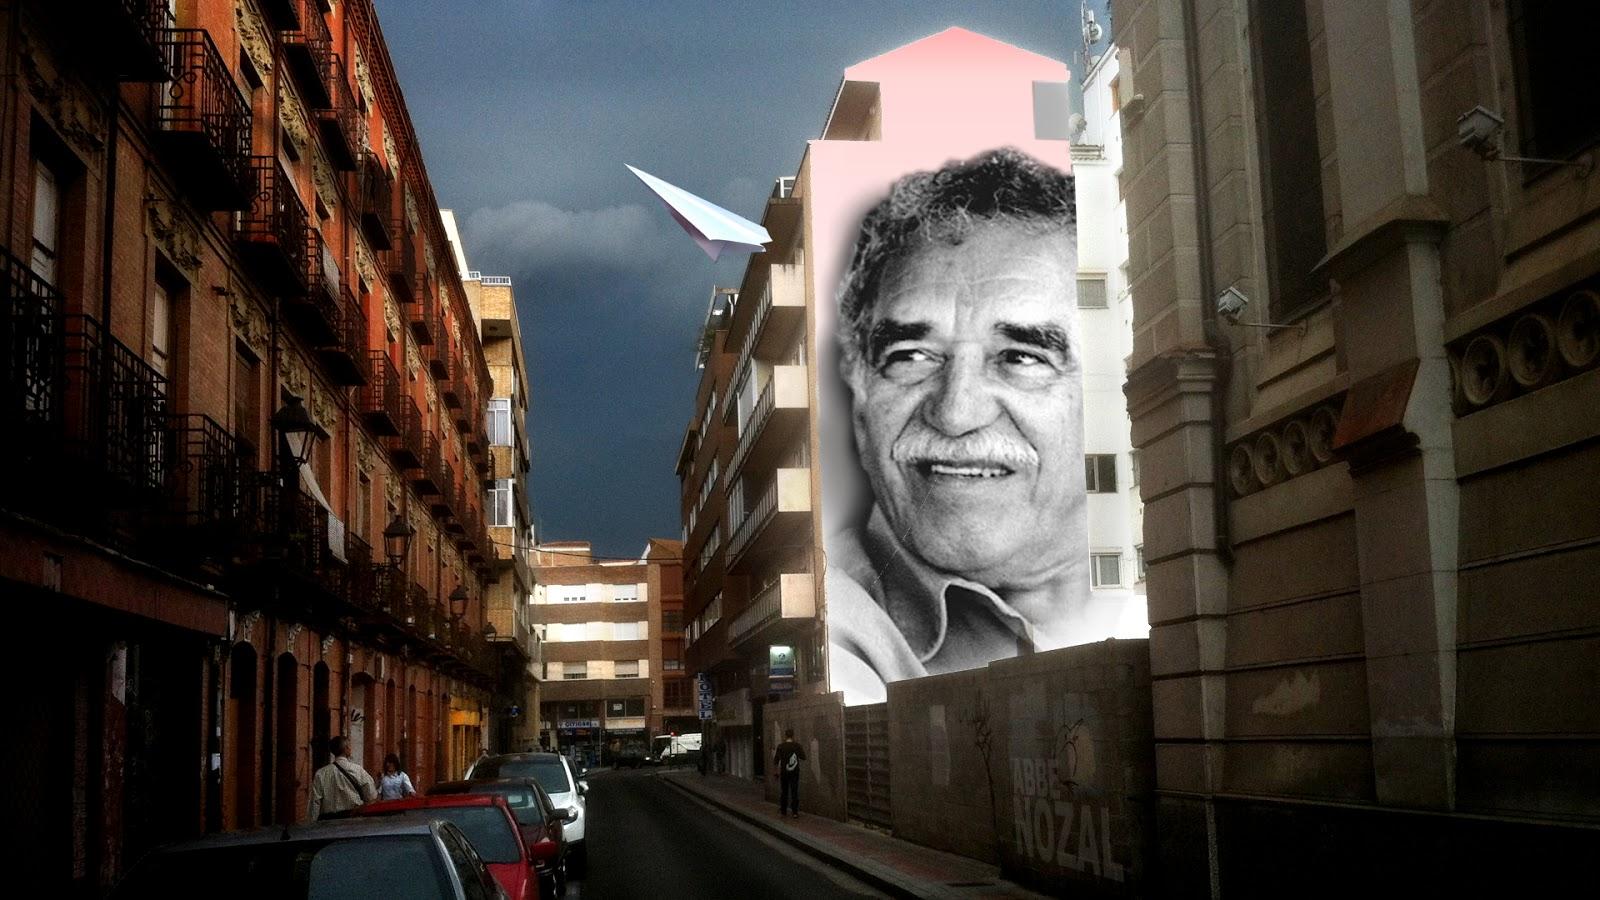 Homenaje a Gabriel García Márquez, 2014 Abbé Nozal